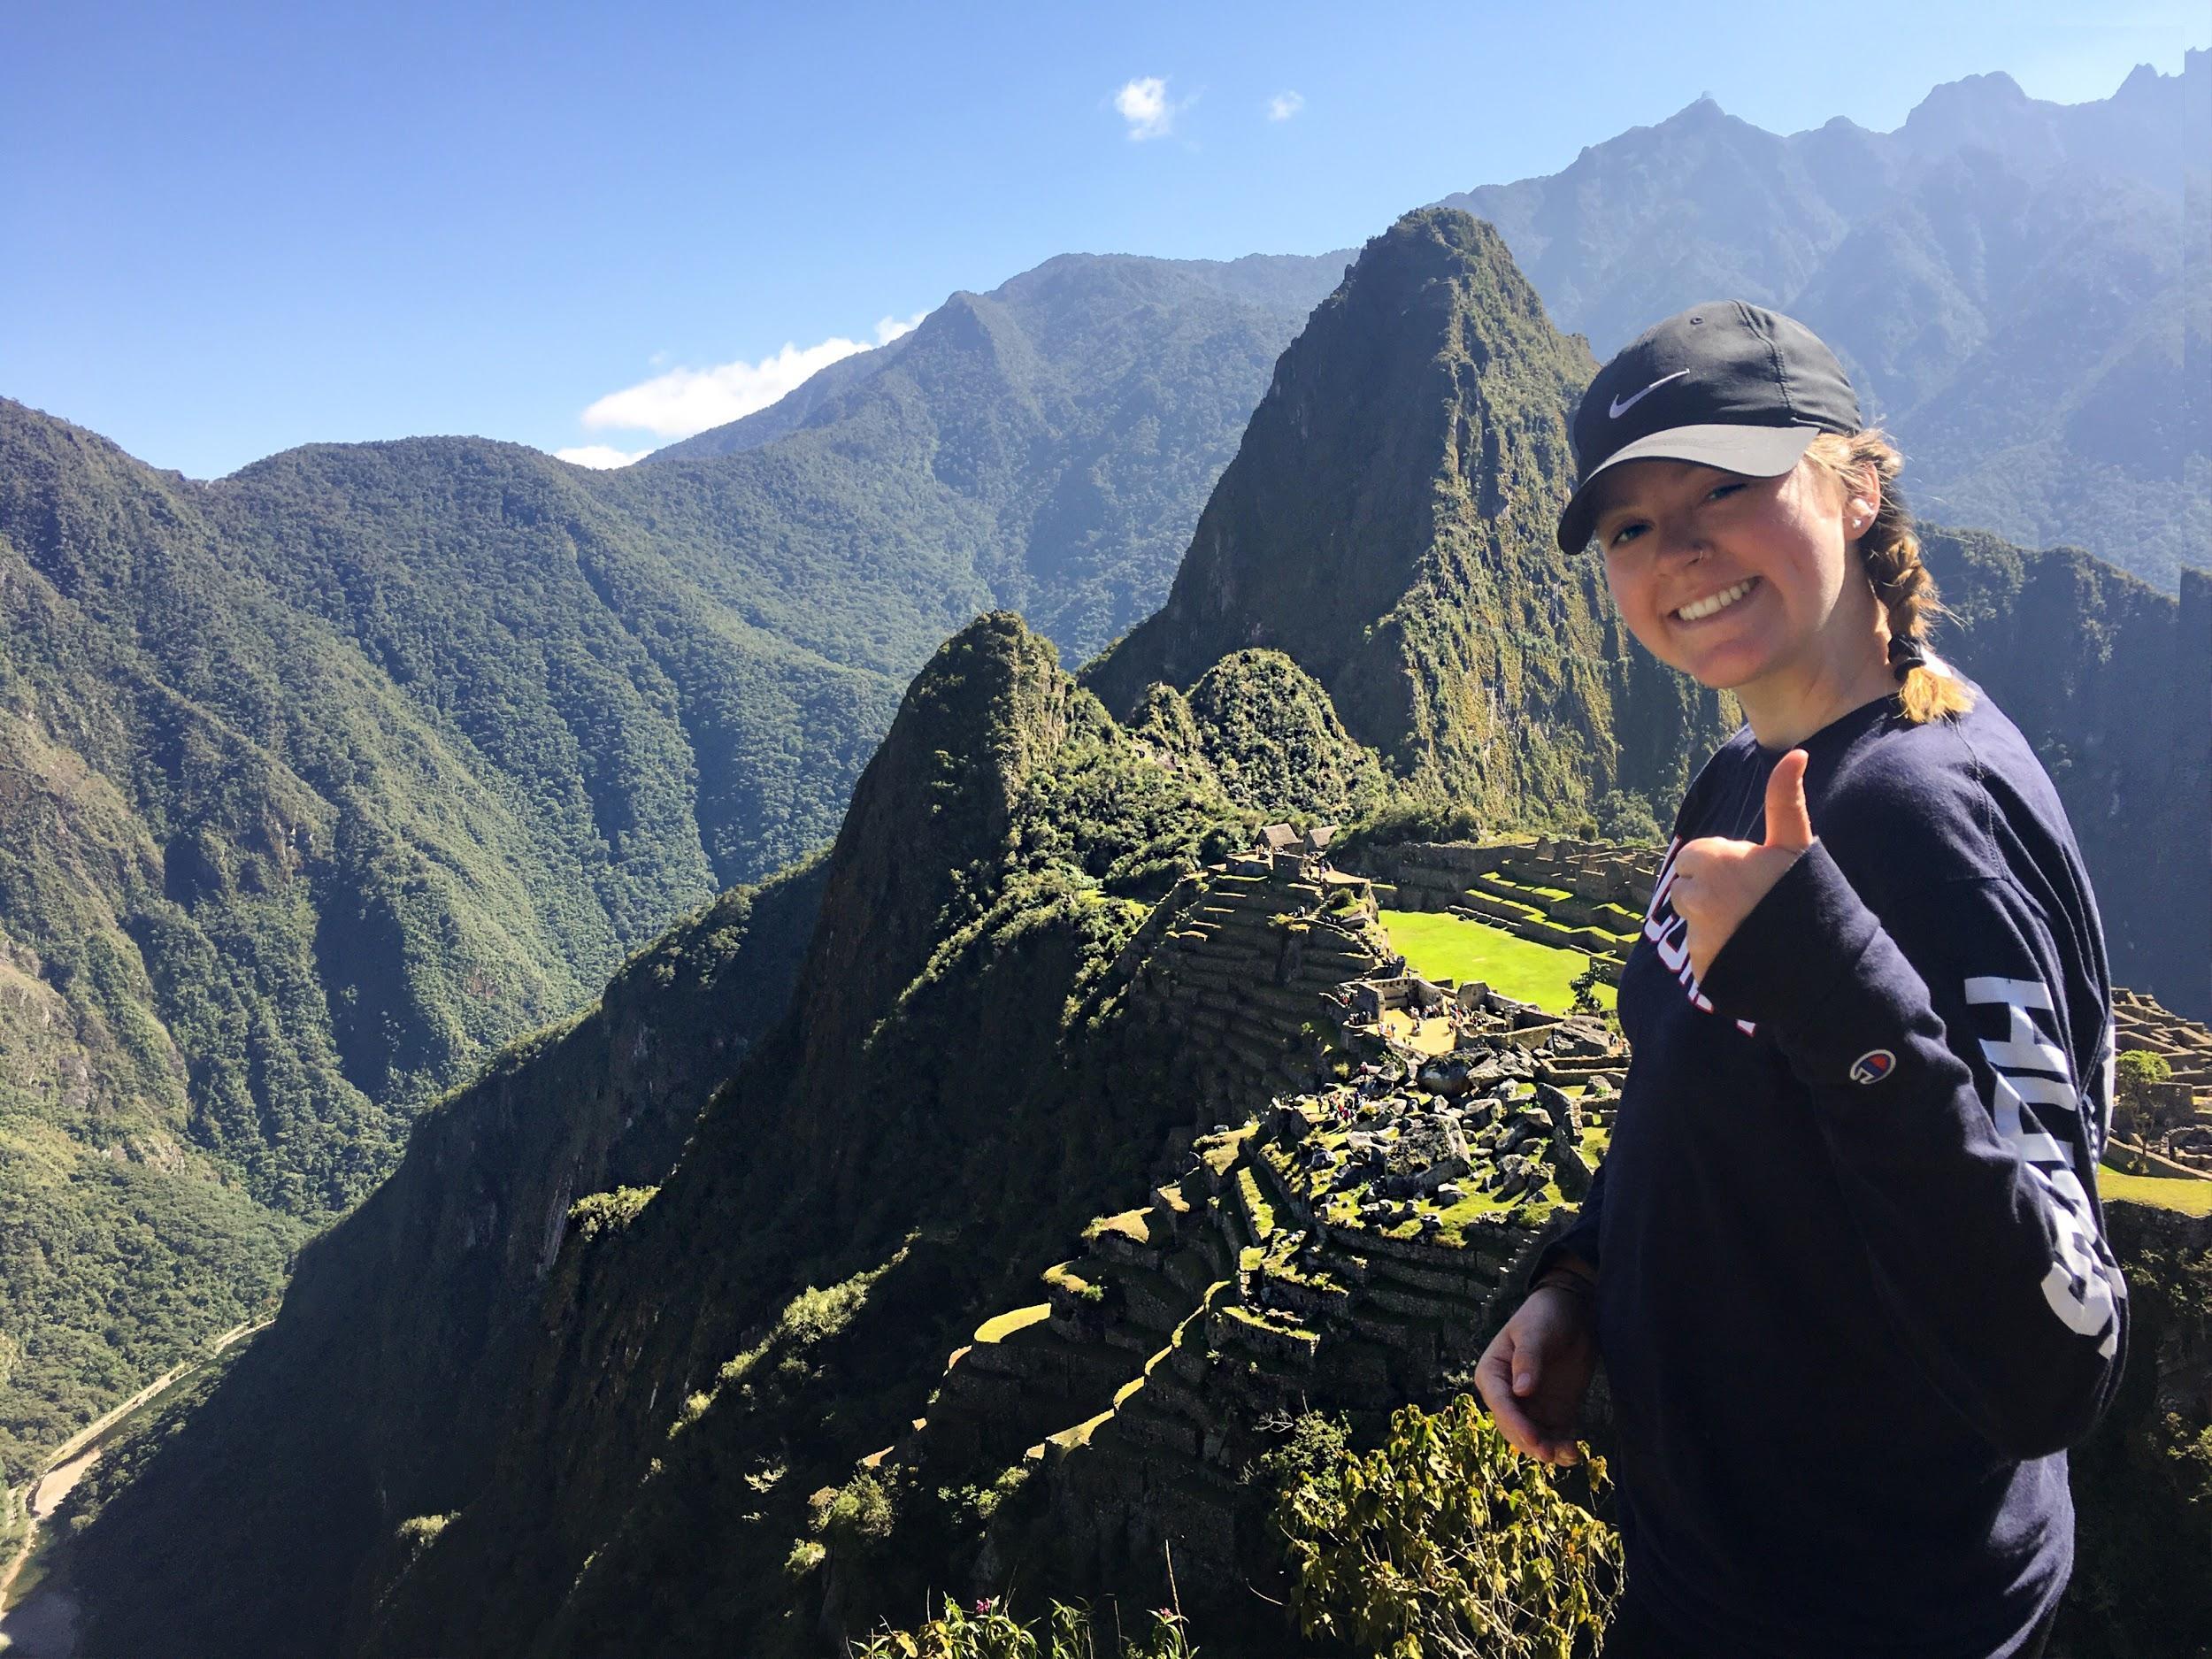 Photo by Rita Plante, Plante at the Machu Picchu Ruins in 2018